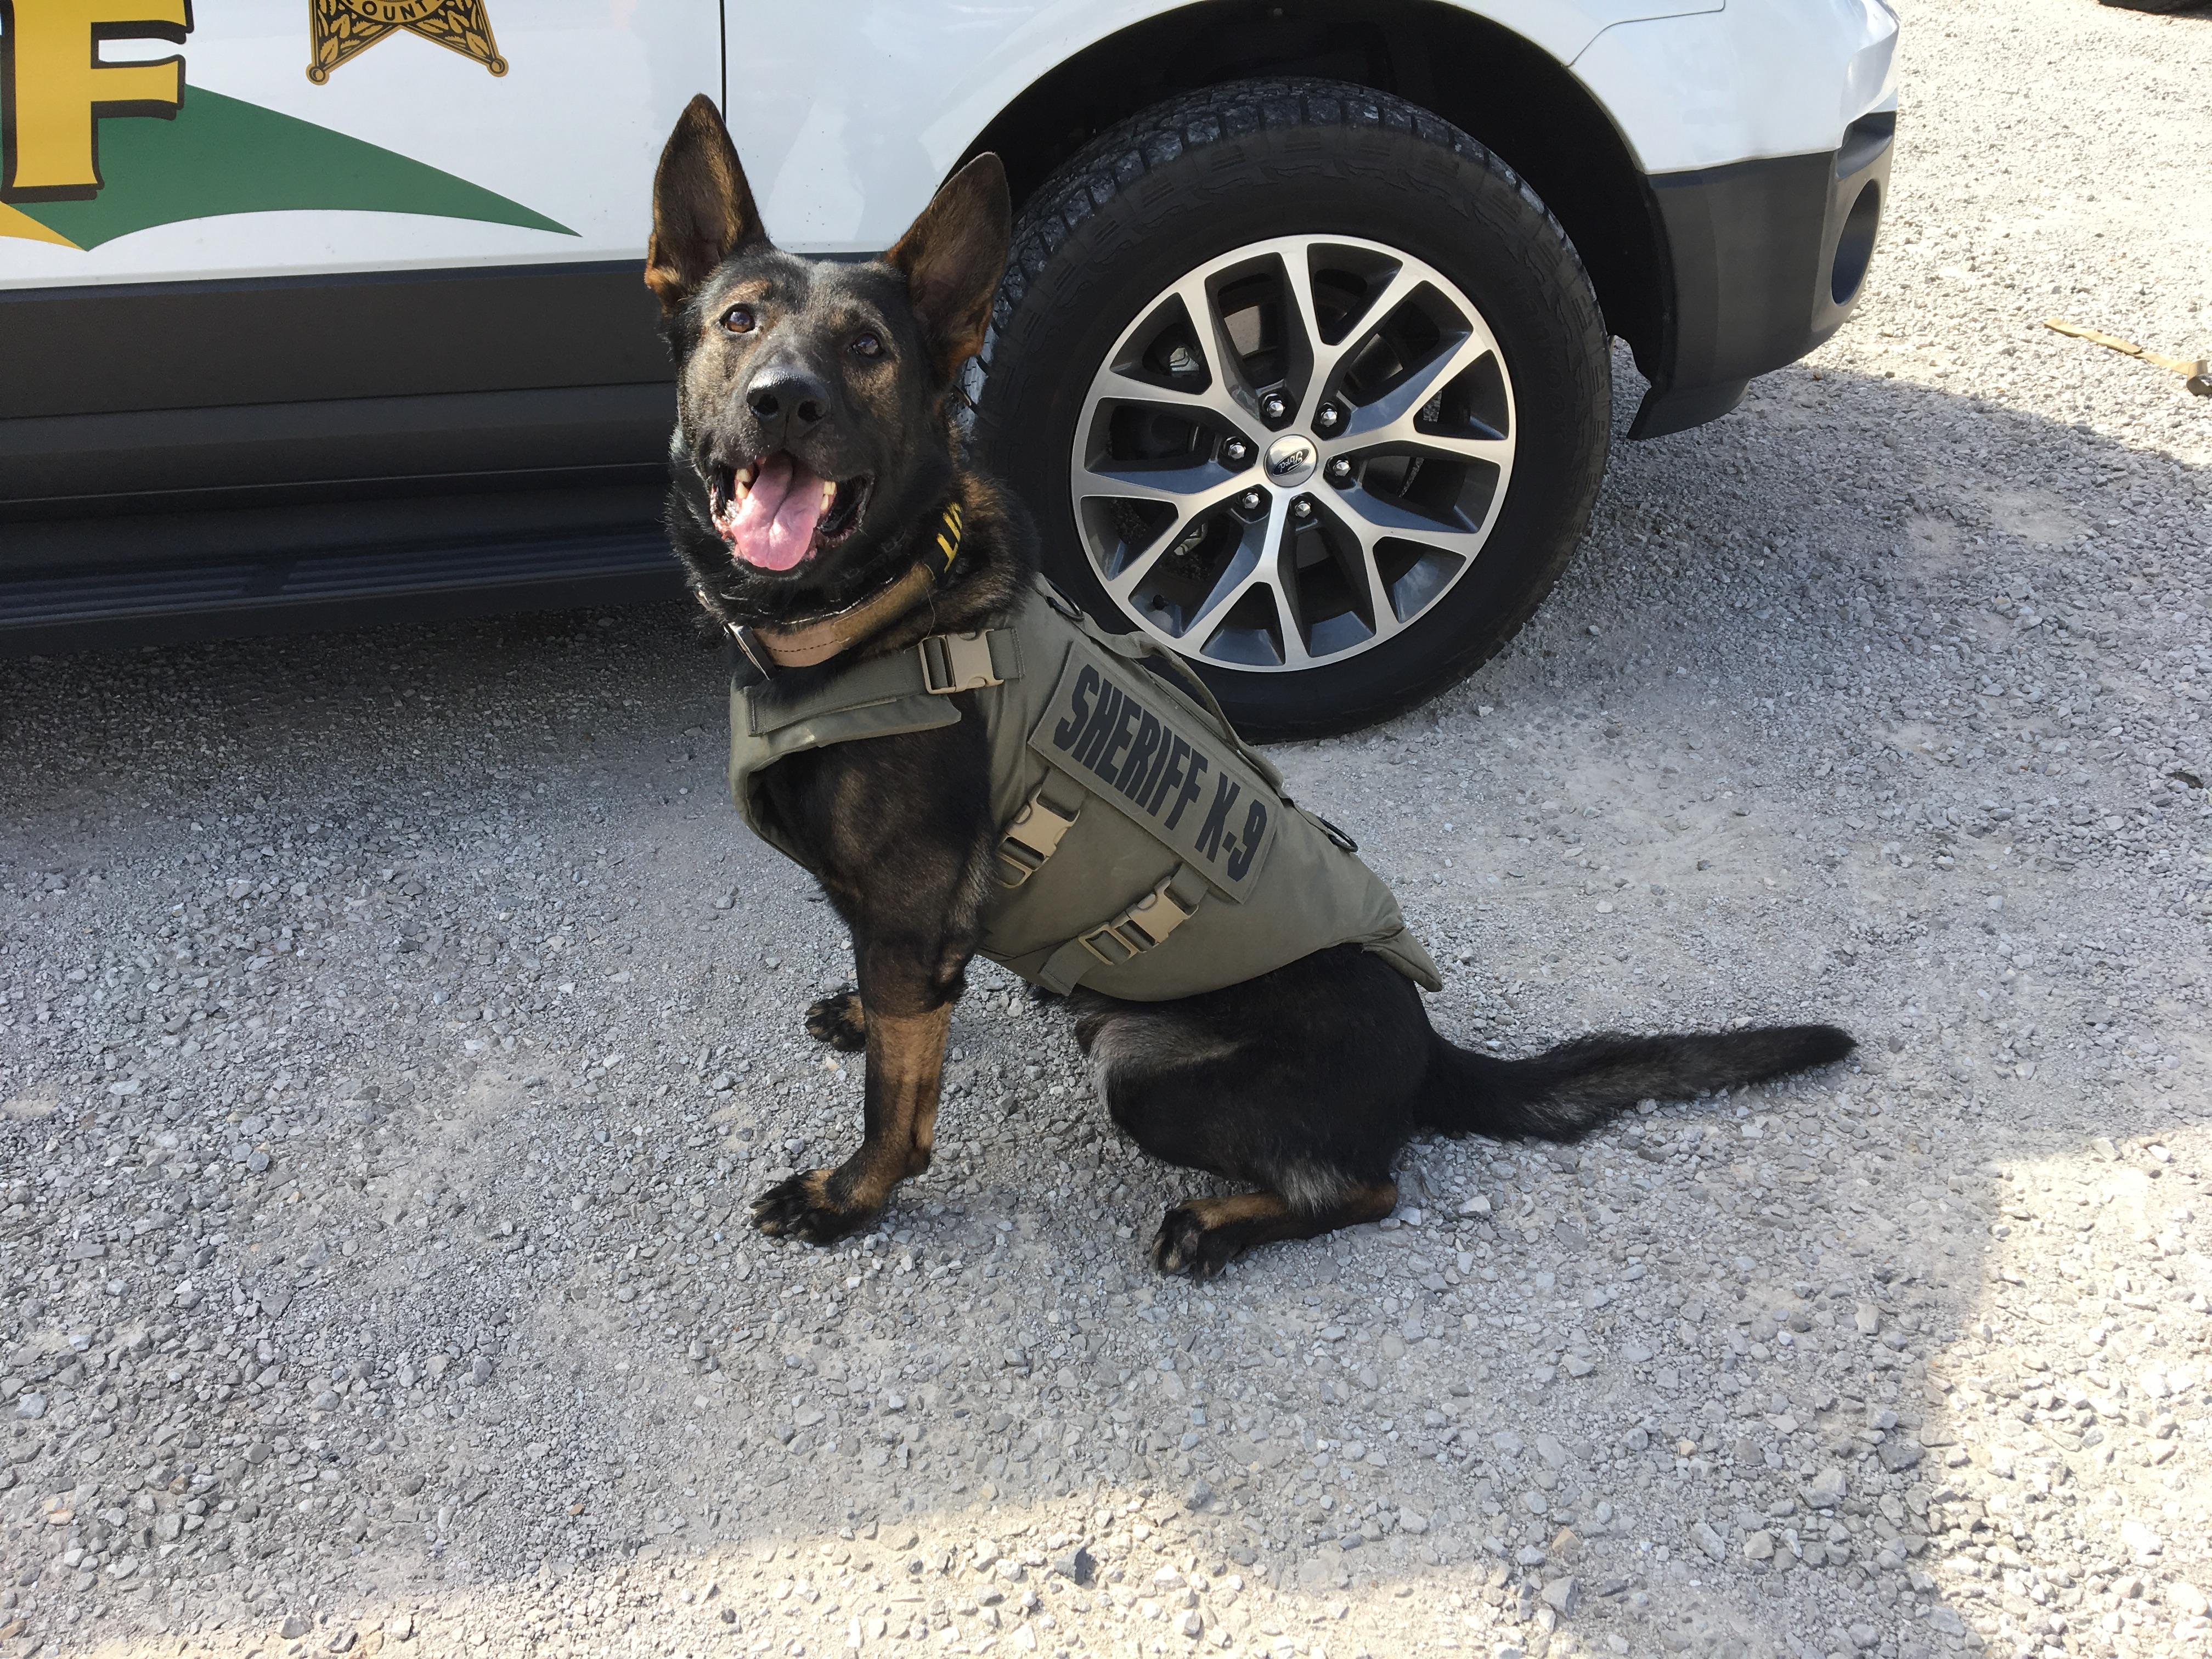 Dog with bullet proof vest